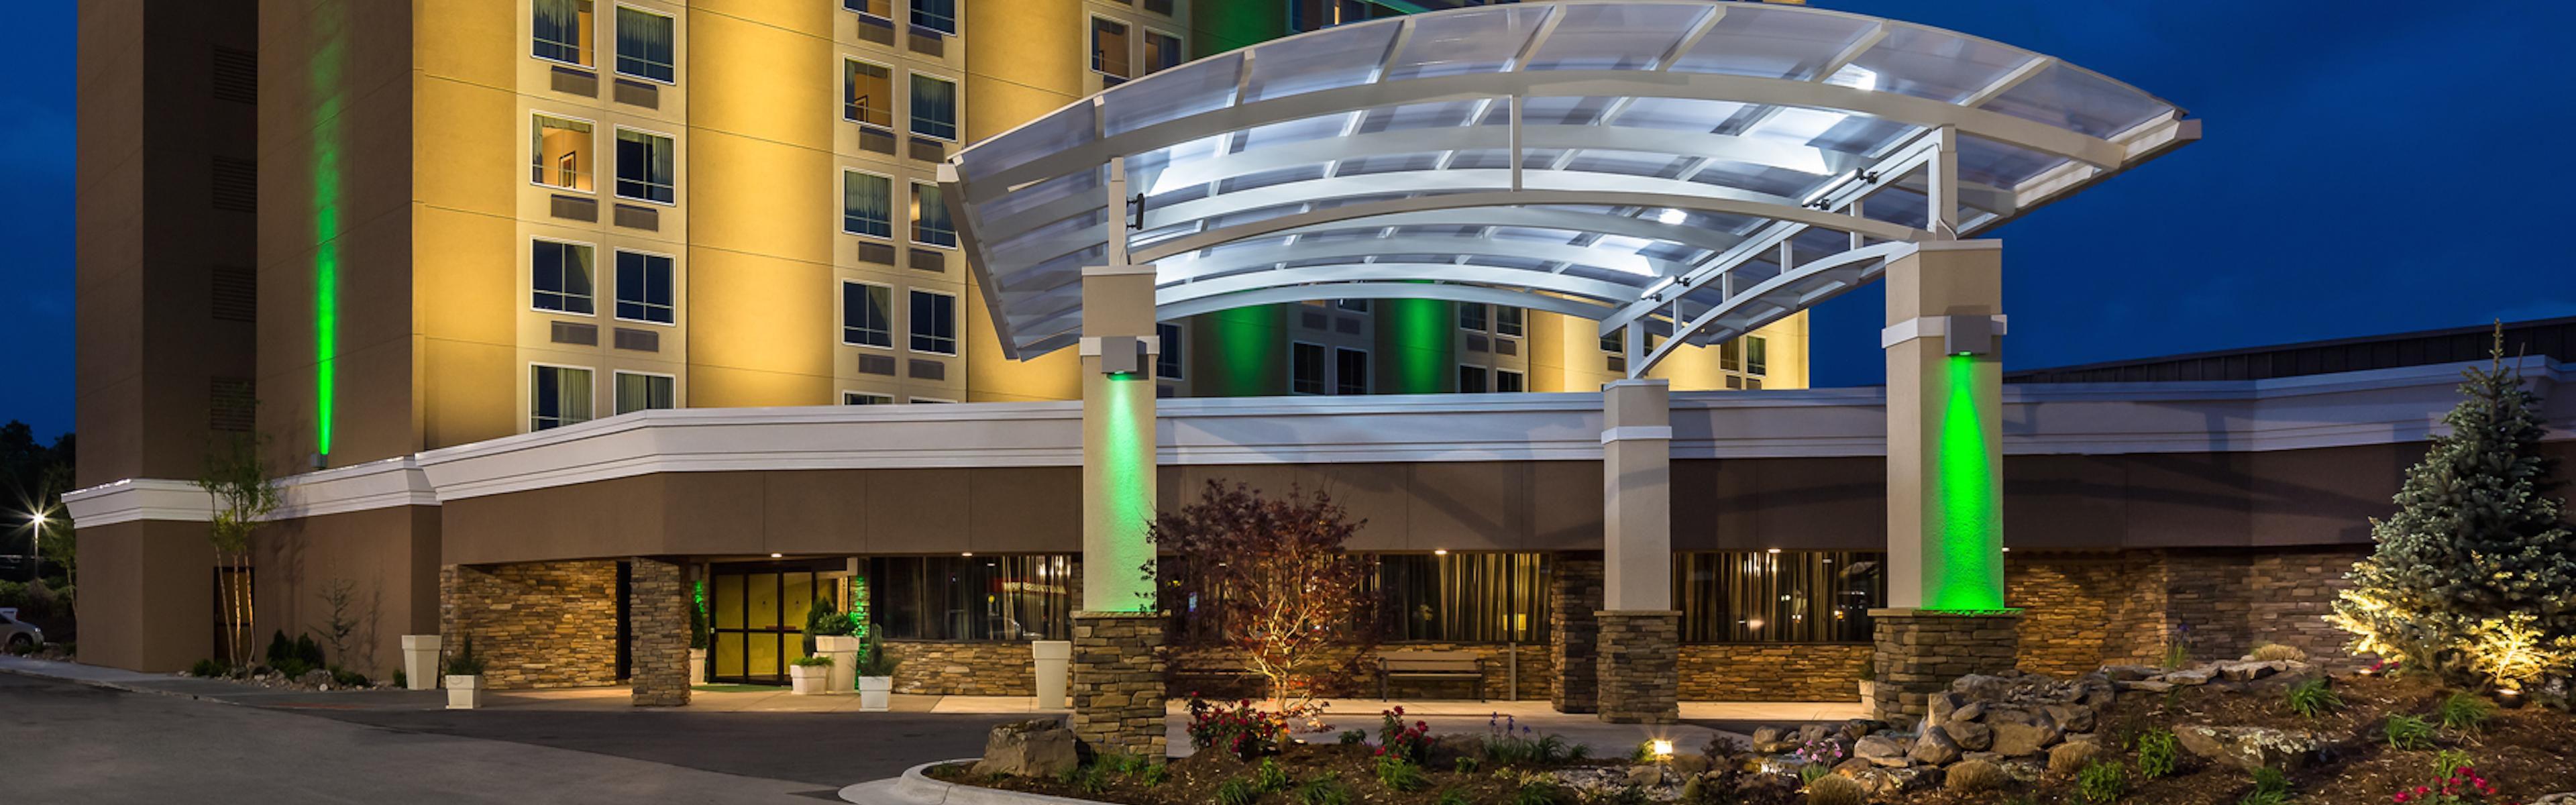 Holiday Inn Wichita East I-35 image 0